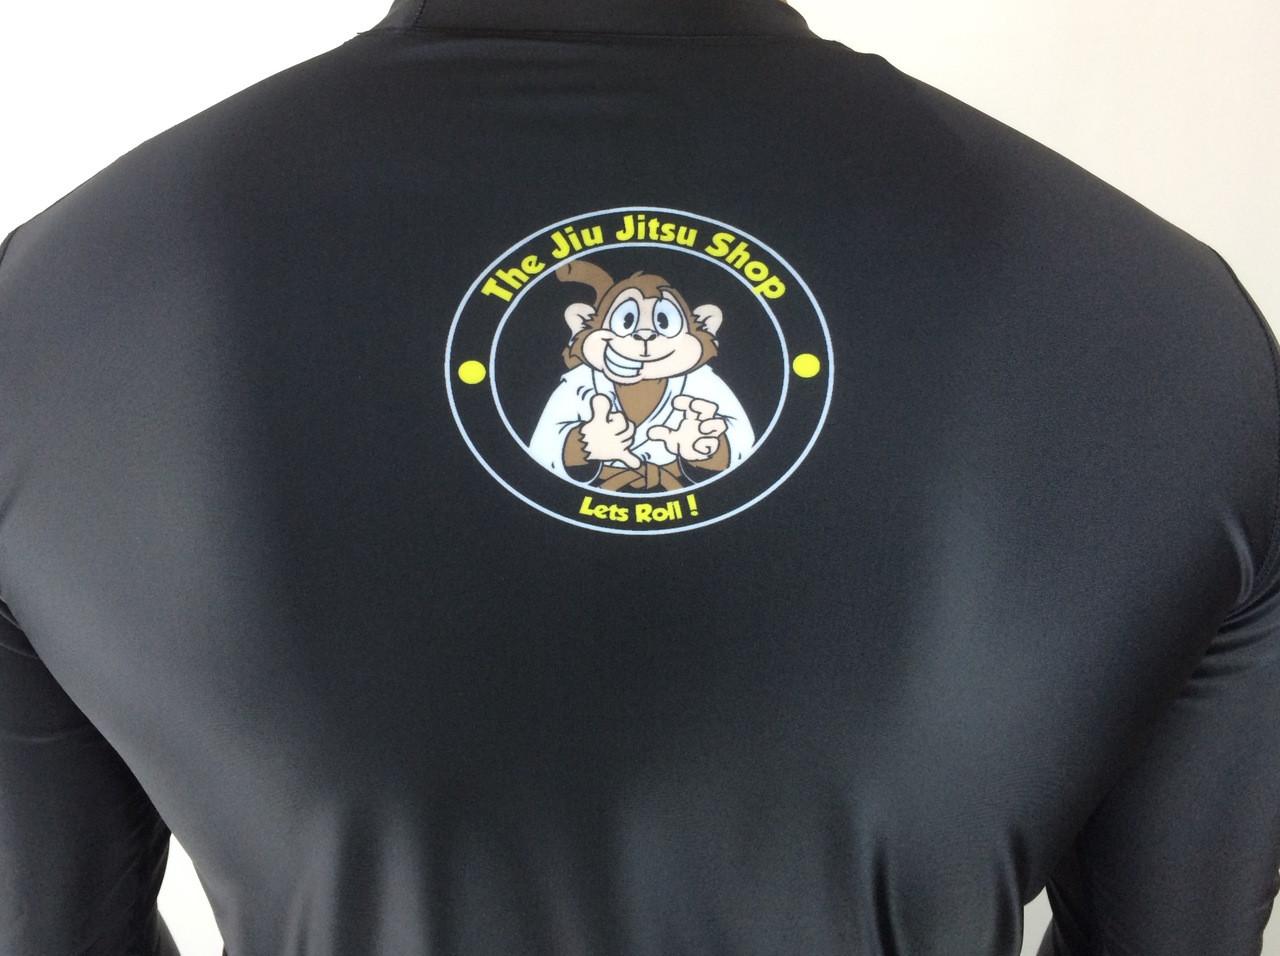 "The Jiu Jitsu Shop's ""Essentials"" Long Sleeve Rashguard, featuring Rocky the Monkey. Exclusively at www.thejiujitsushop.com. Free domestic shipping storewide."